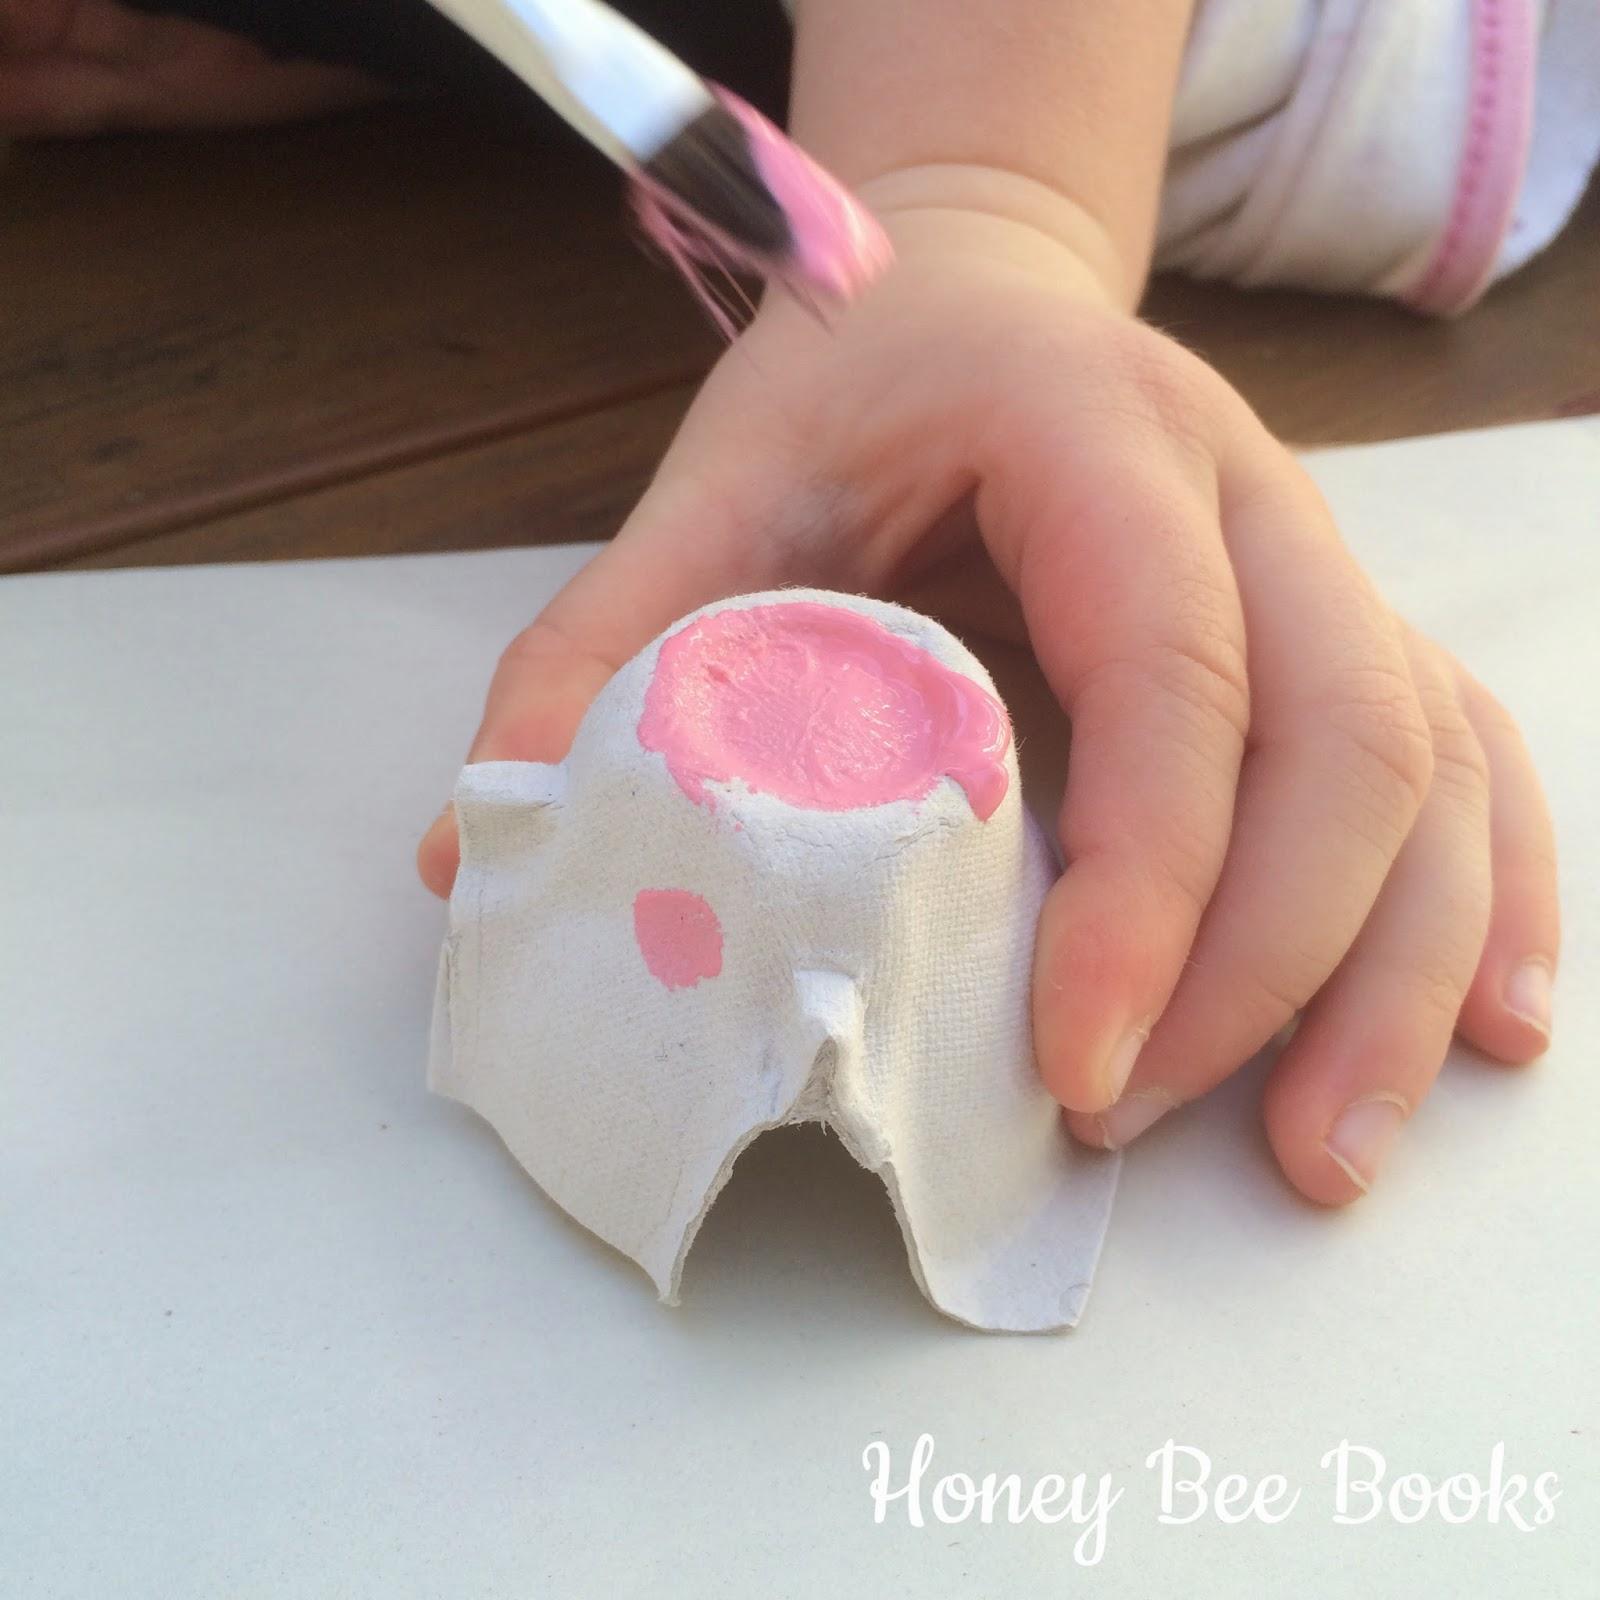 Use an egg carton to create a pig snout